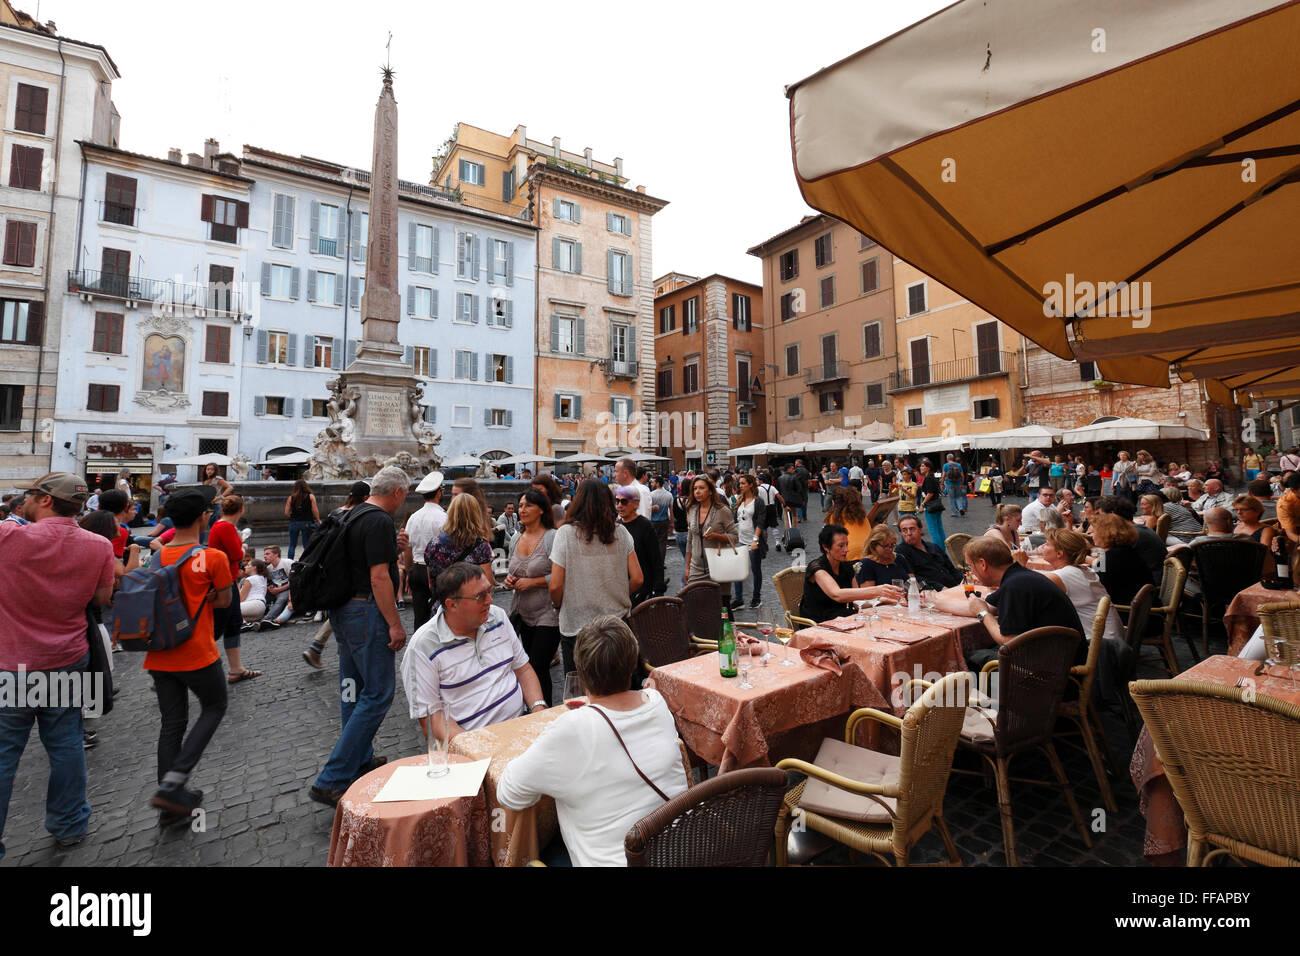 restaurants on Piazza della Rotonda, Rome, Italy - Stock Image